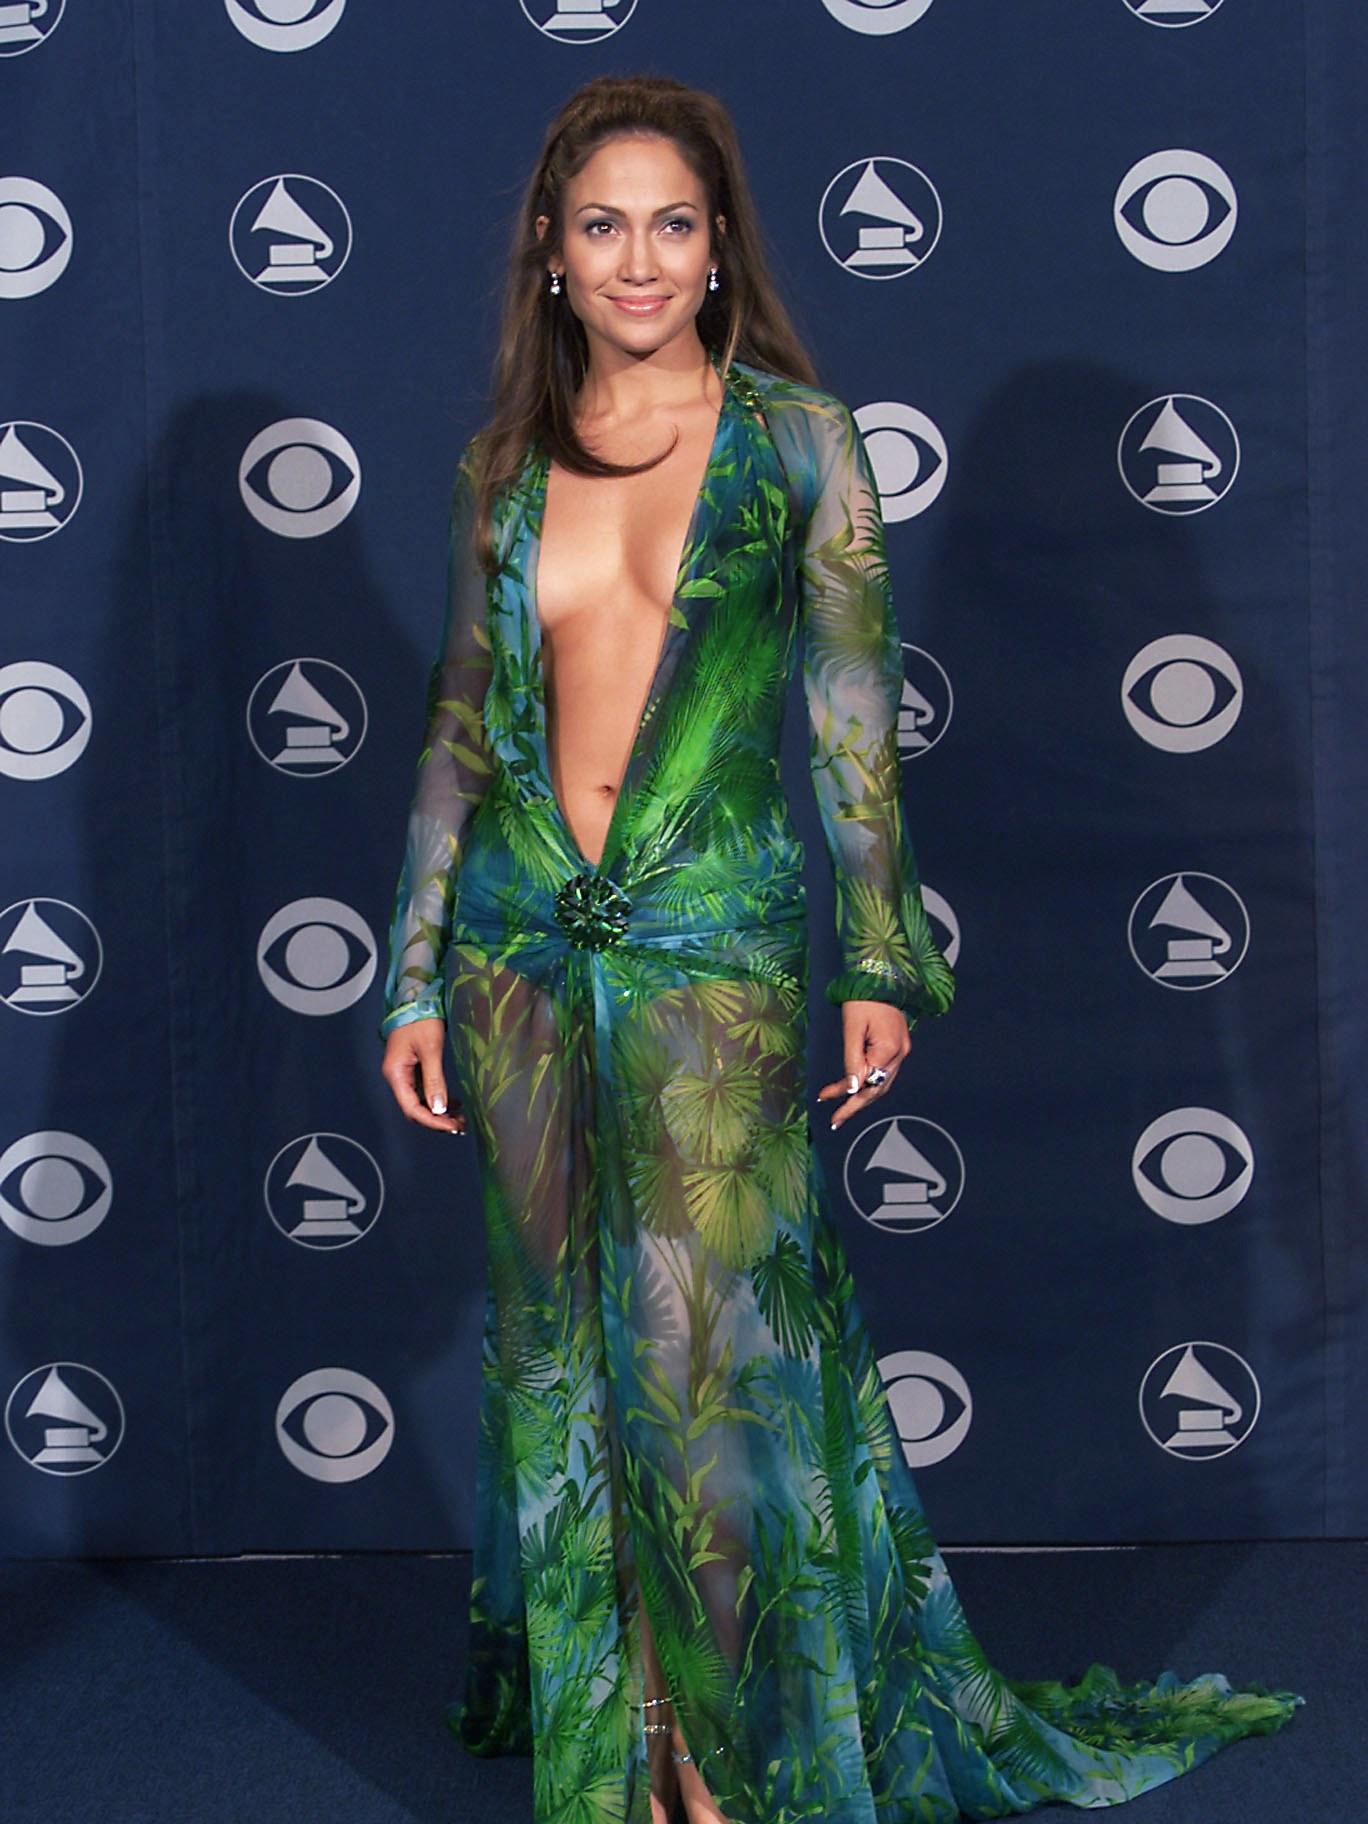 Thời trang thảm đỏ Jennifer Lopez 2000